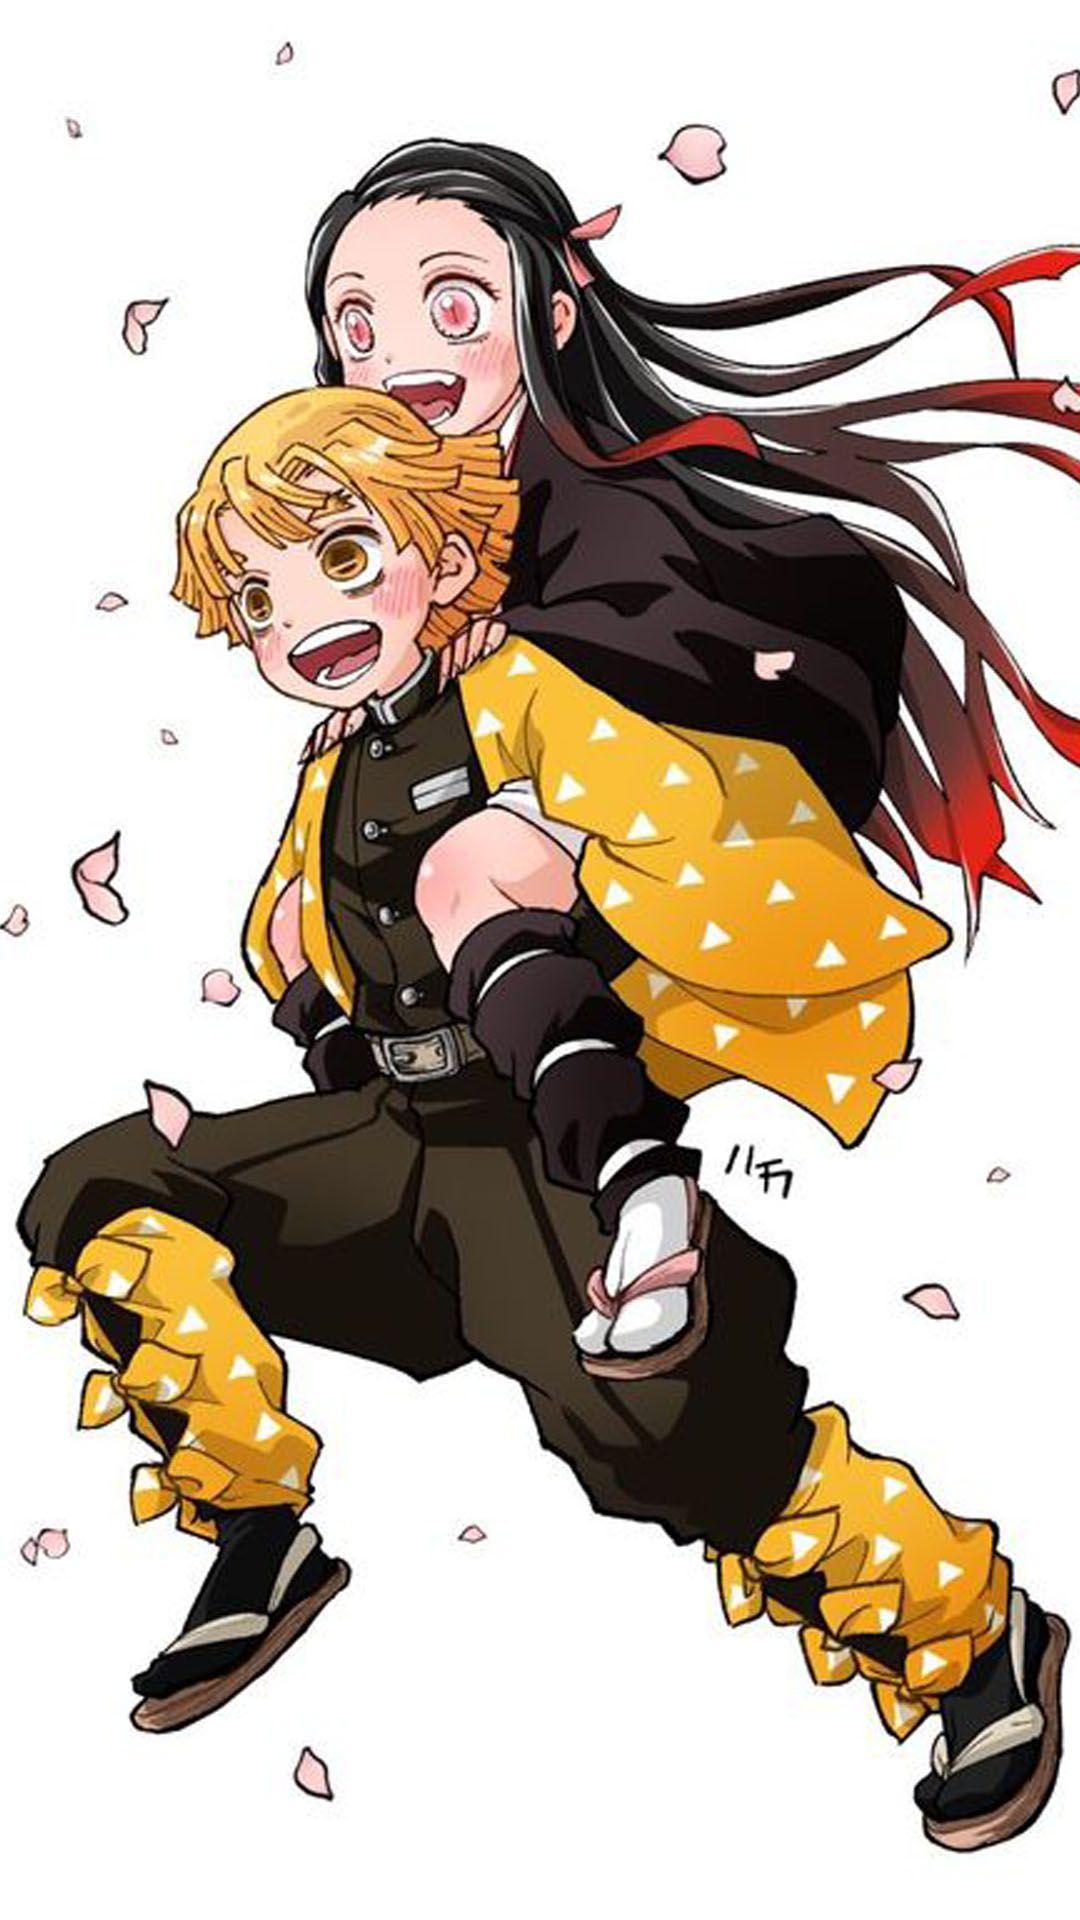 Agatsuma Zenitsu Demon Slayer Wallpaper Anime demon